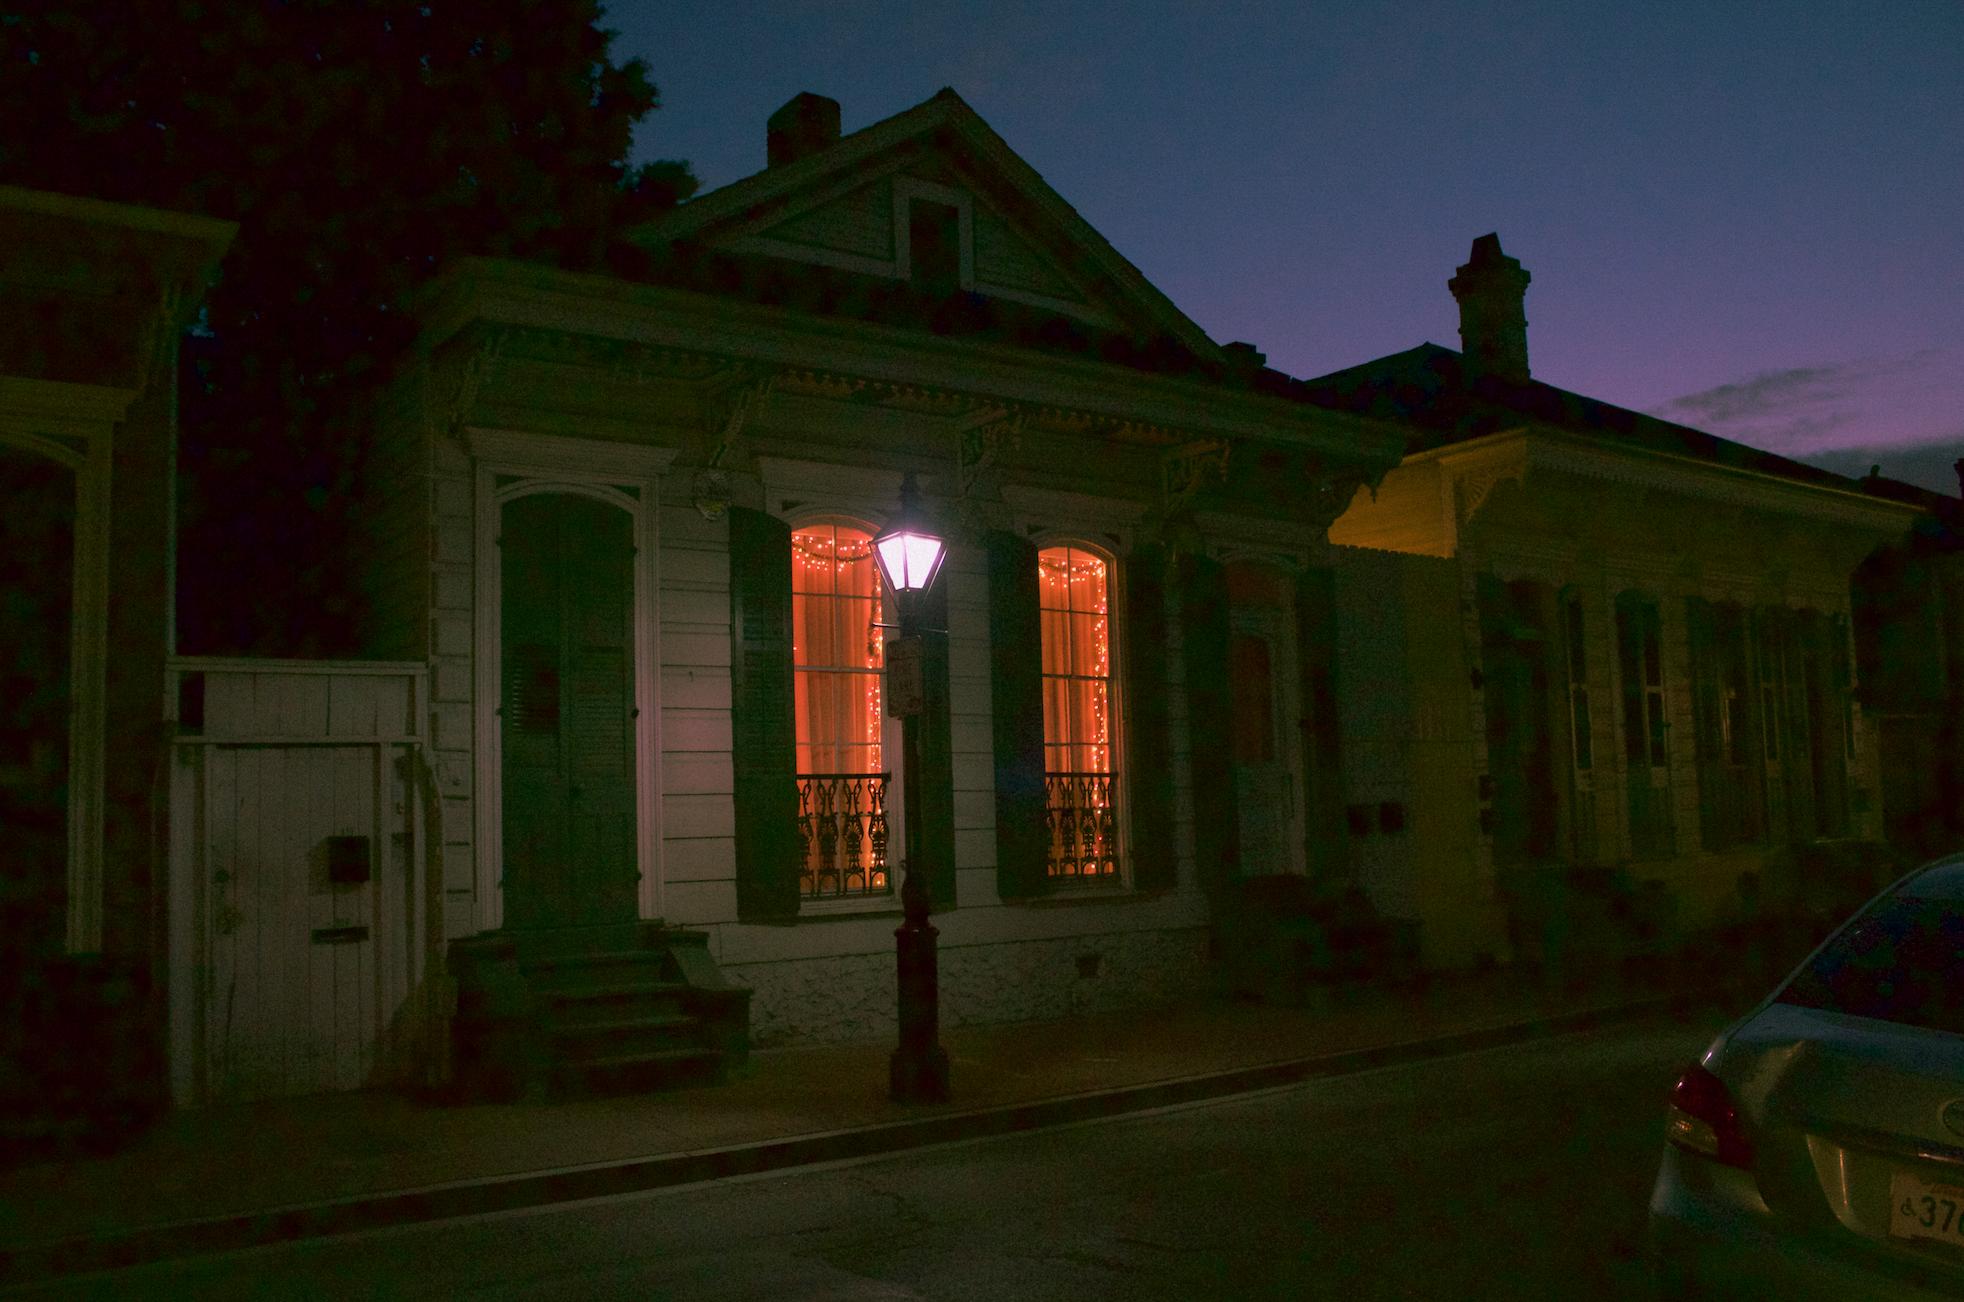 house at night, April 2016